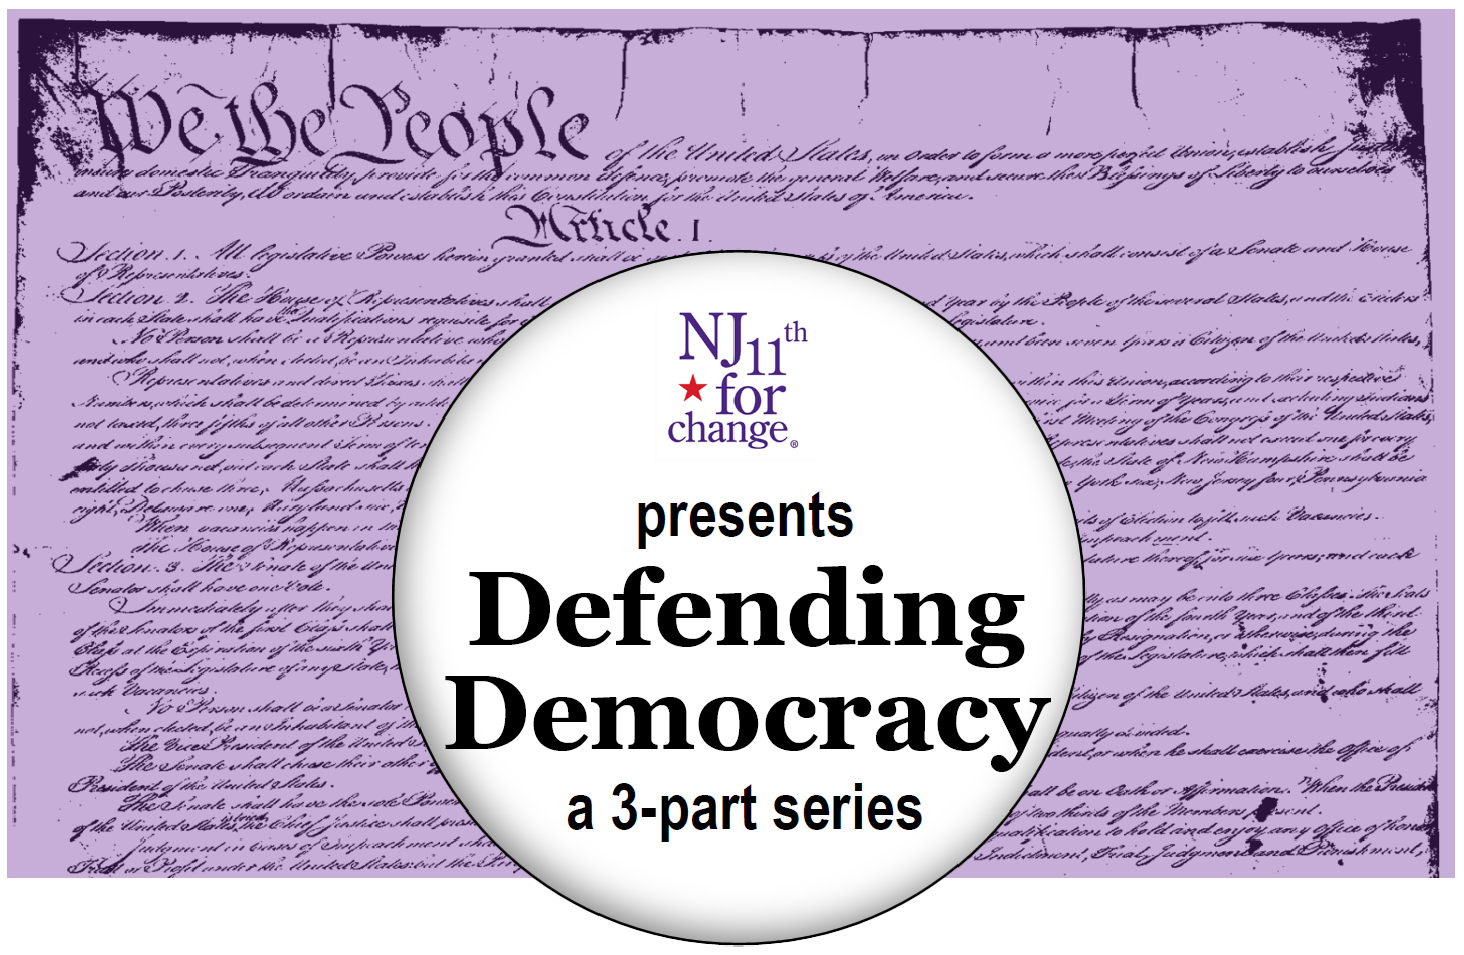 defendingdemocracy3partseries.PNG